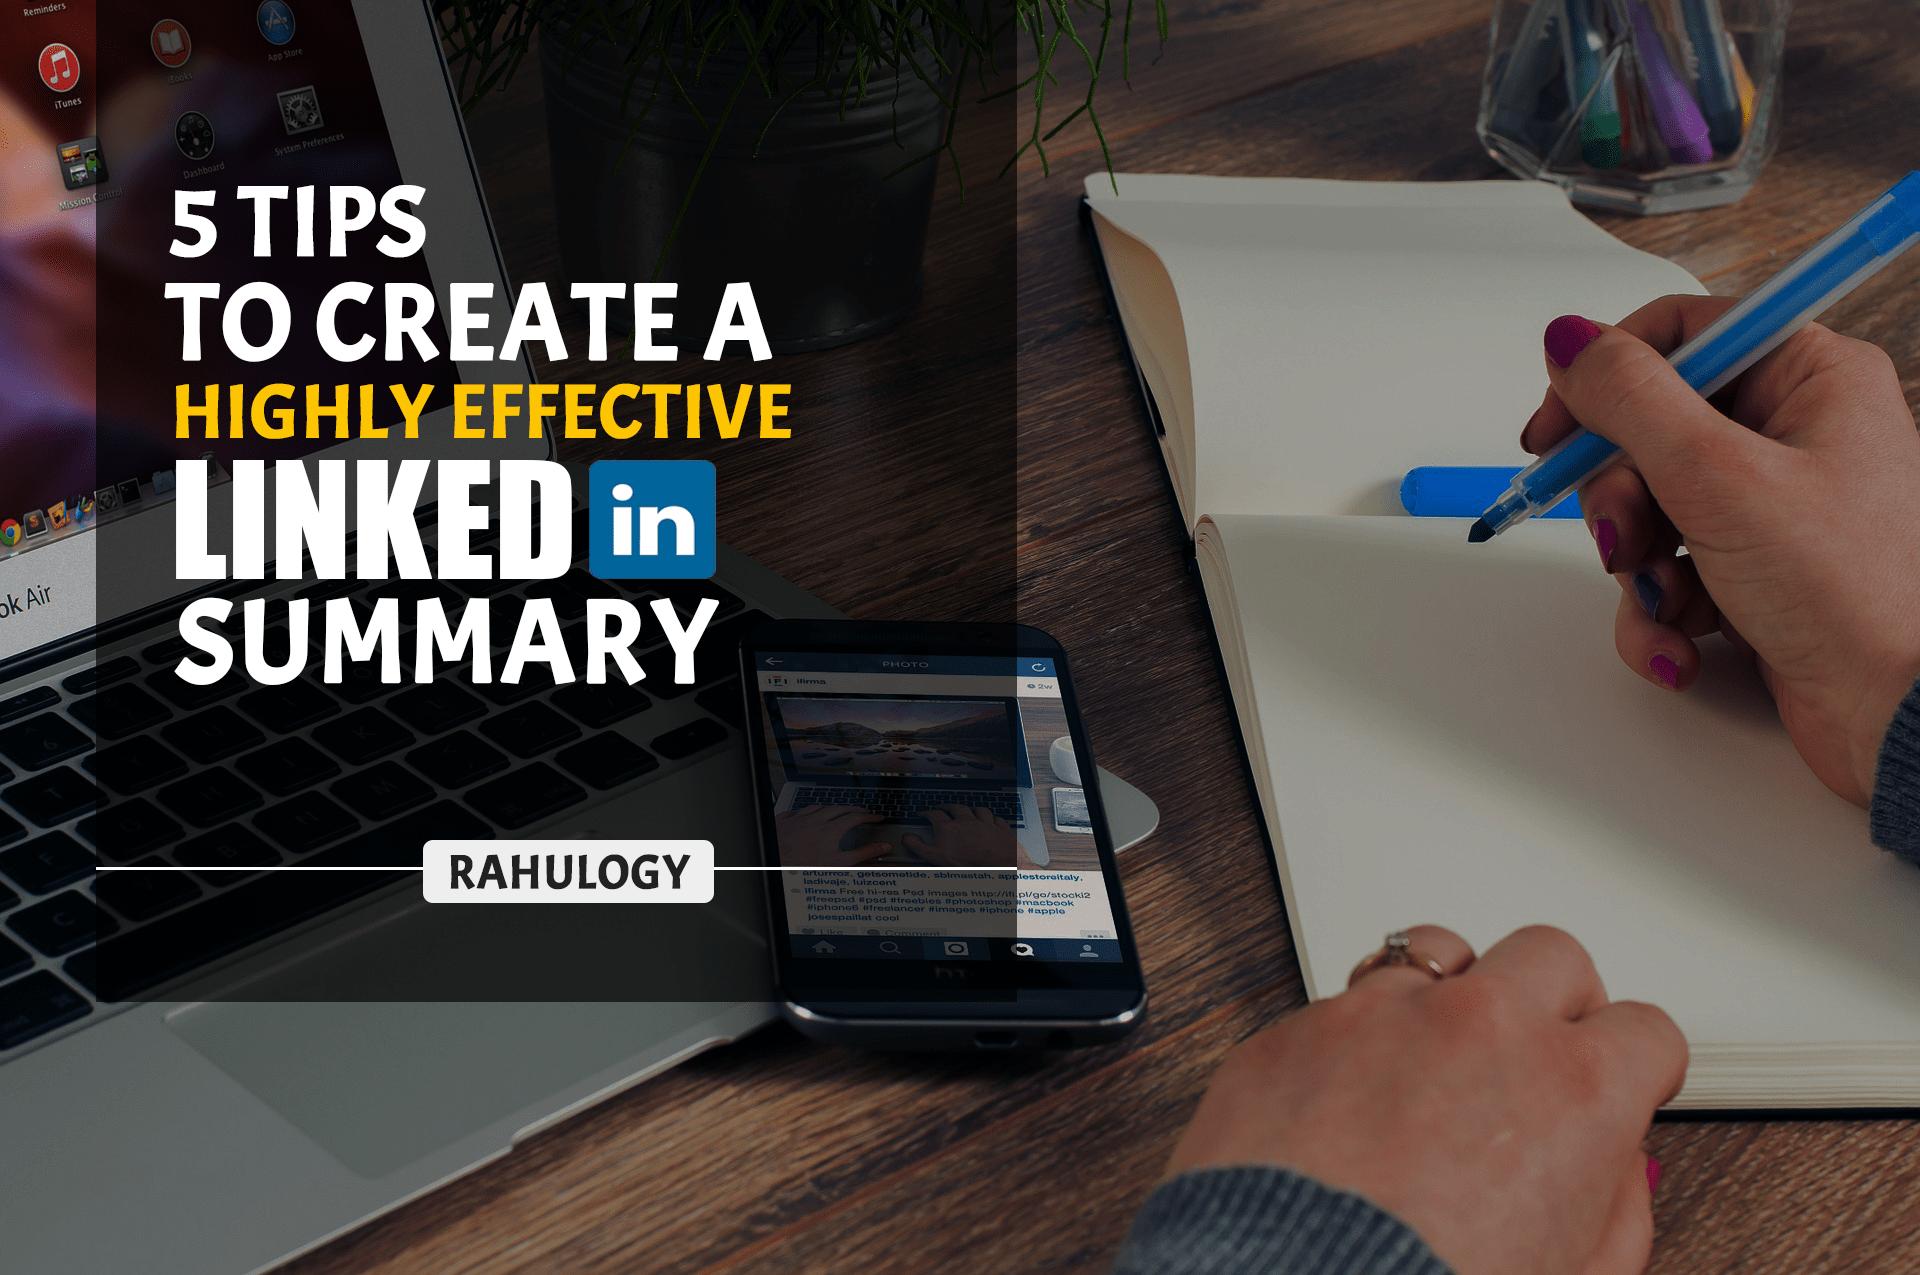 5 tips to create a highly effective LinkedIn summary